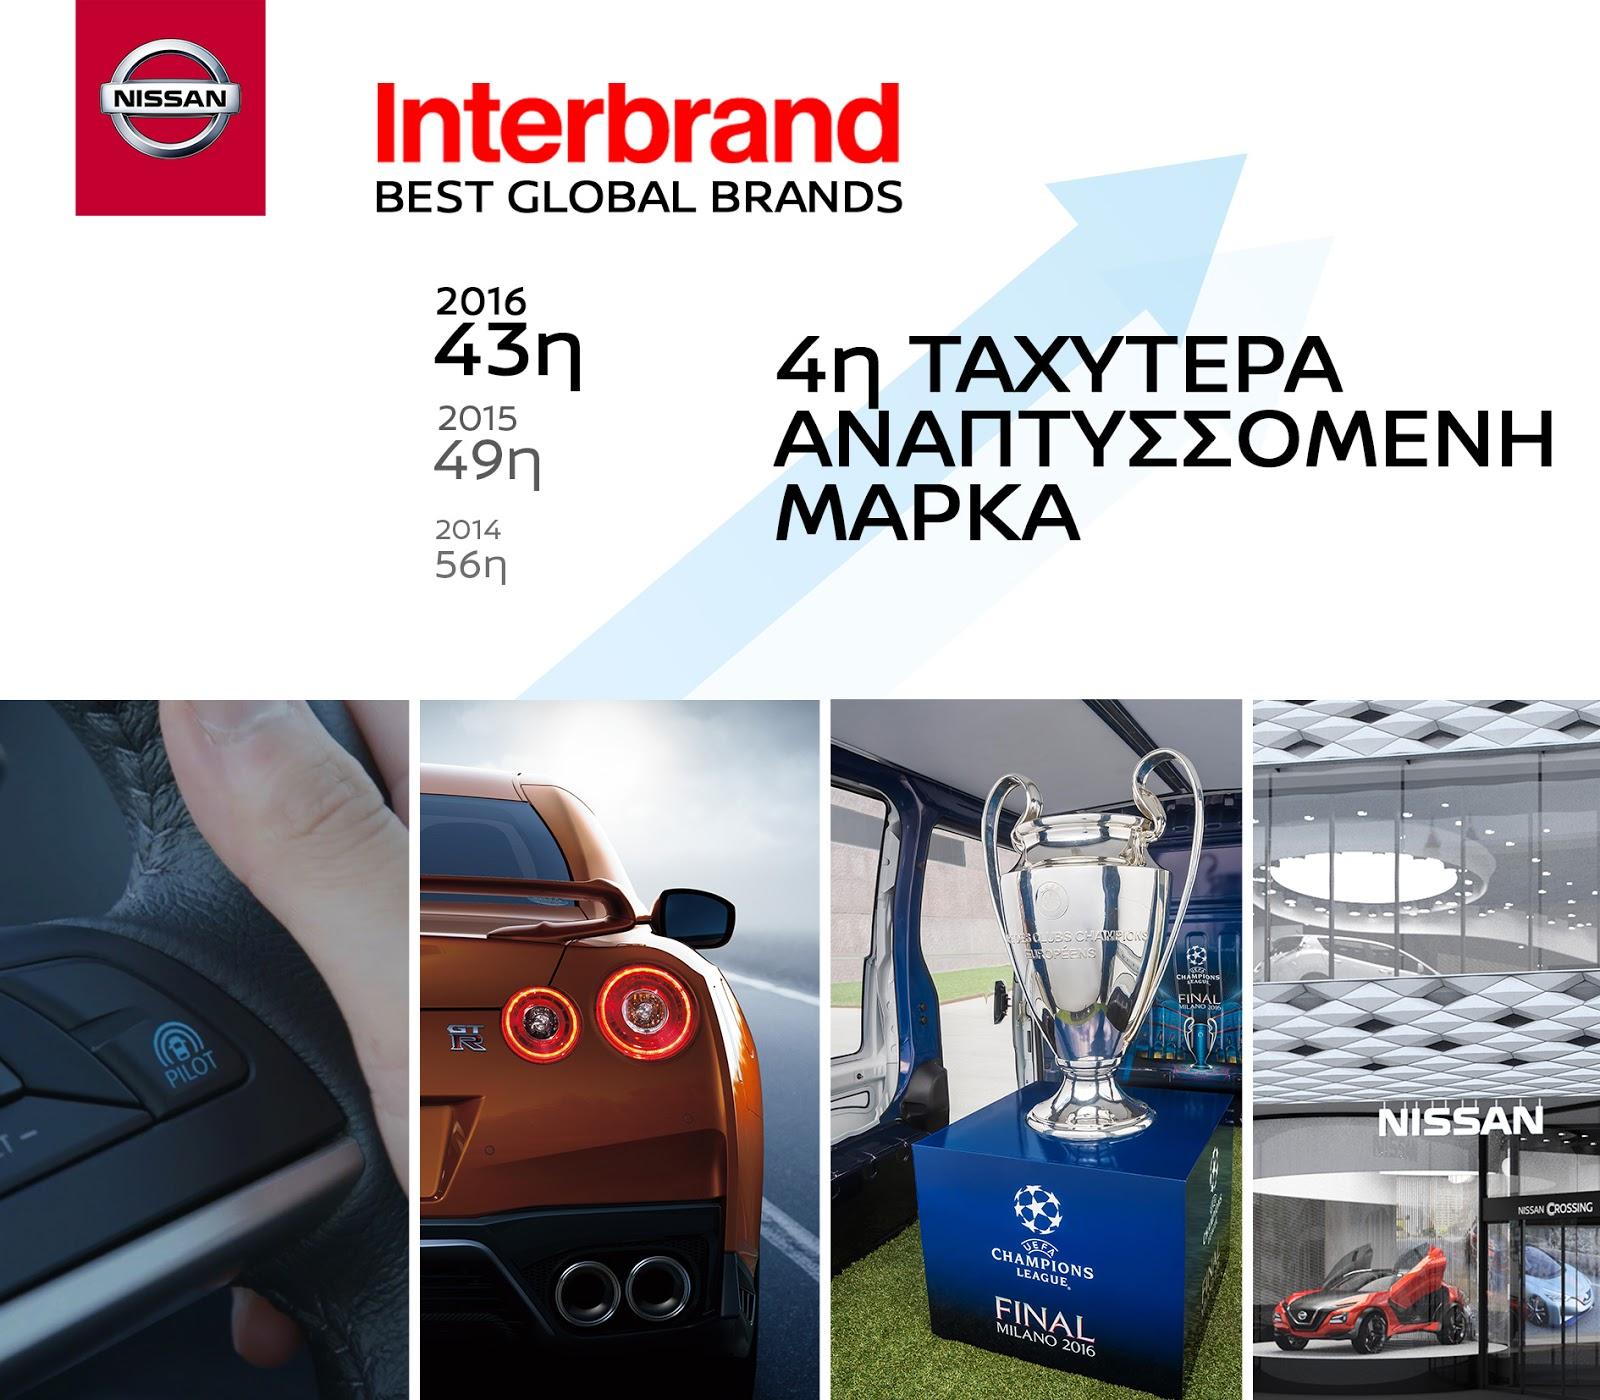 Interbrand infographic B GREEK H Nissan ανάμεσα στα κορυφαία εμπορικά σήματα της Υφηλίου